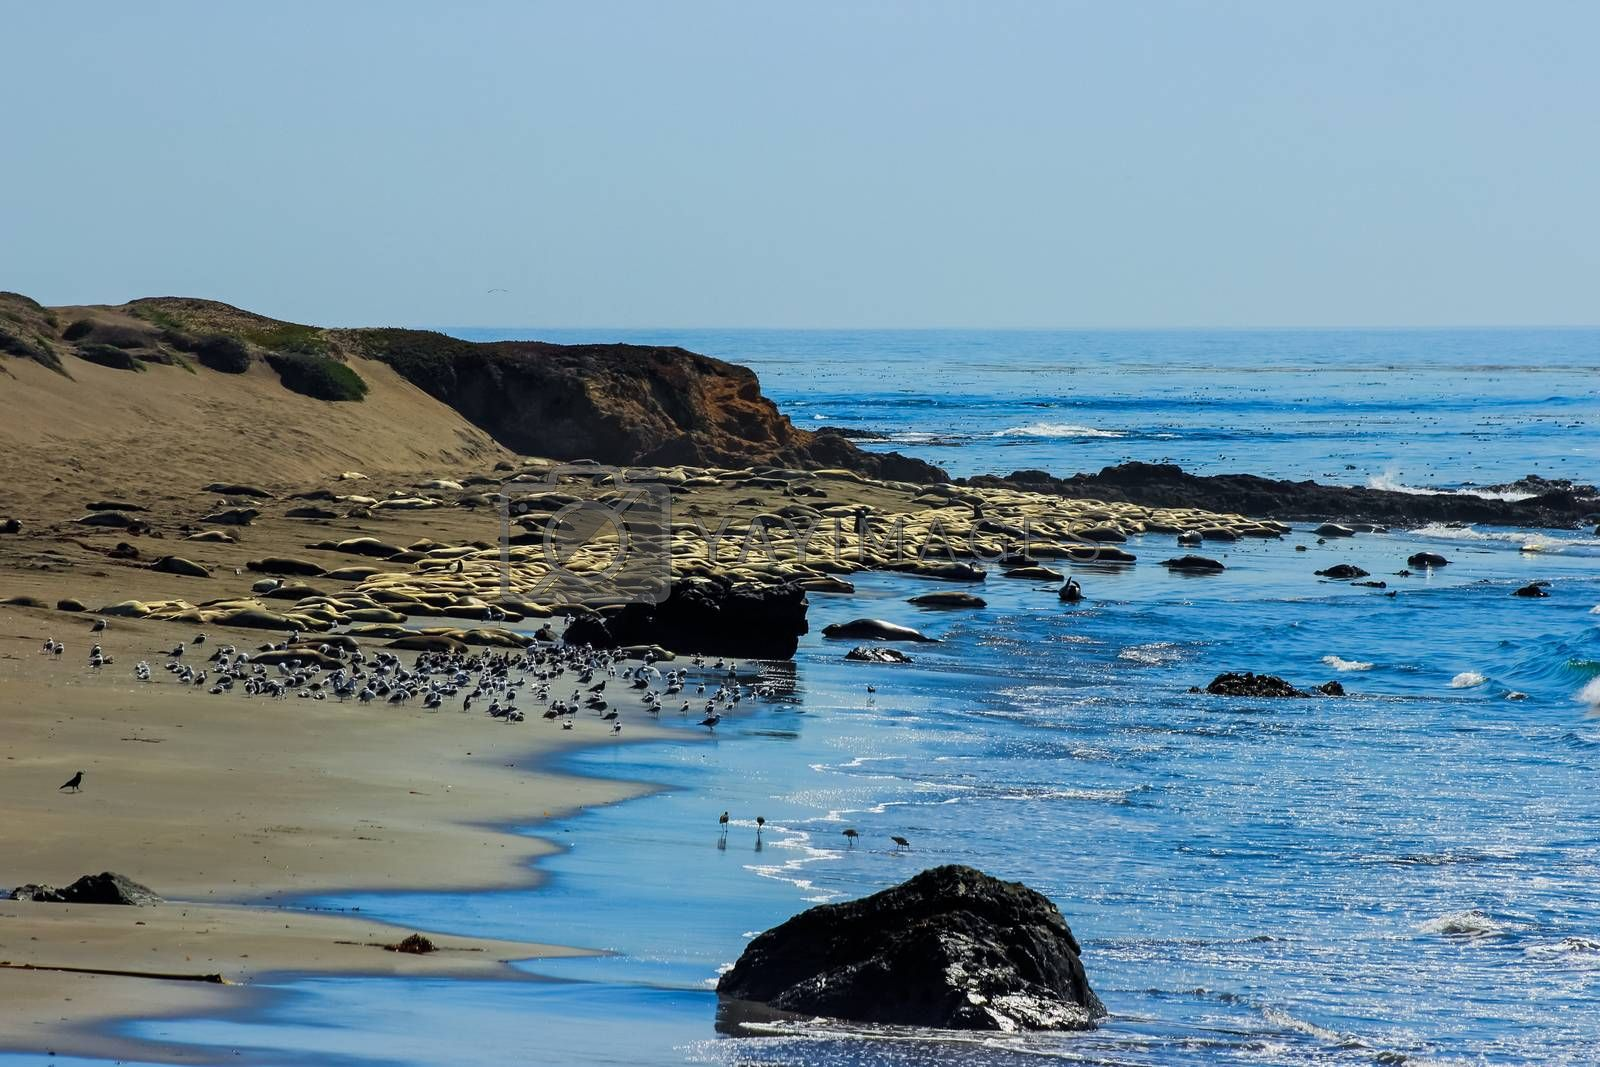 Fur seals on the coast of California, rookery marine mammals